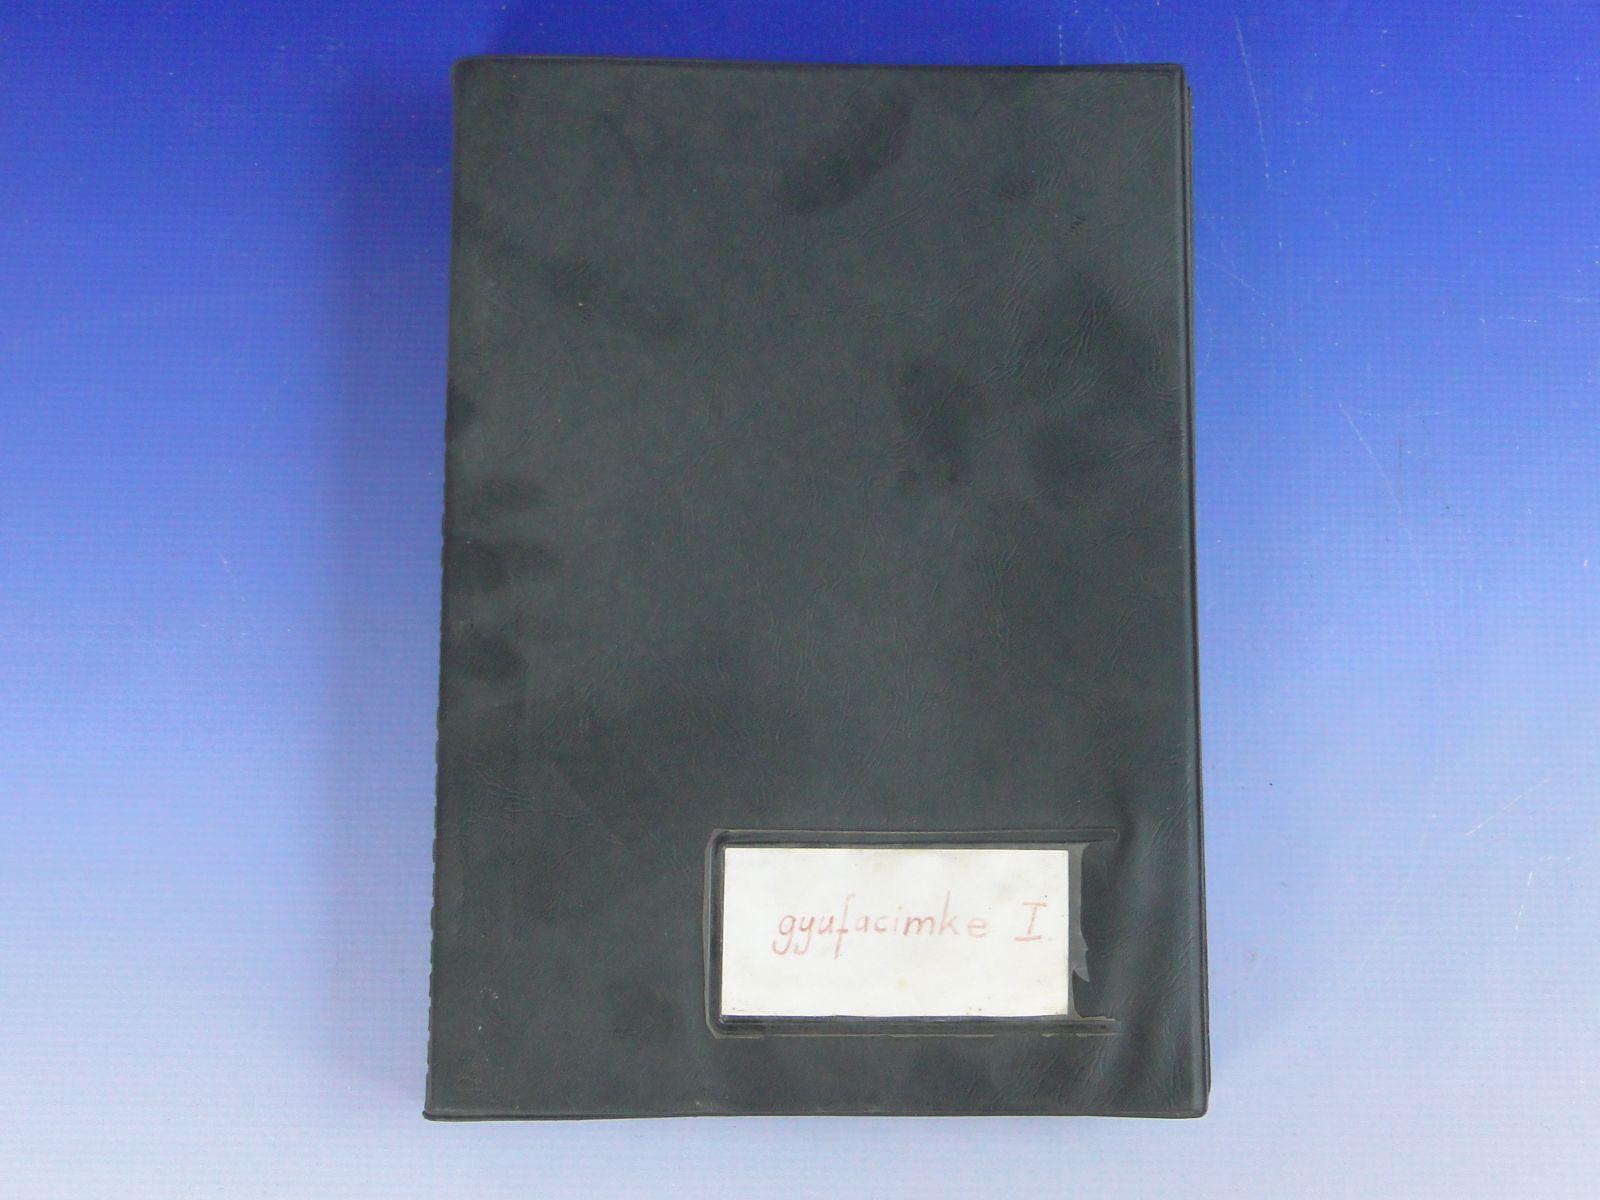 DSC03086.JPG (1600�1200)